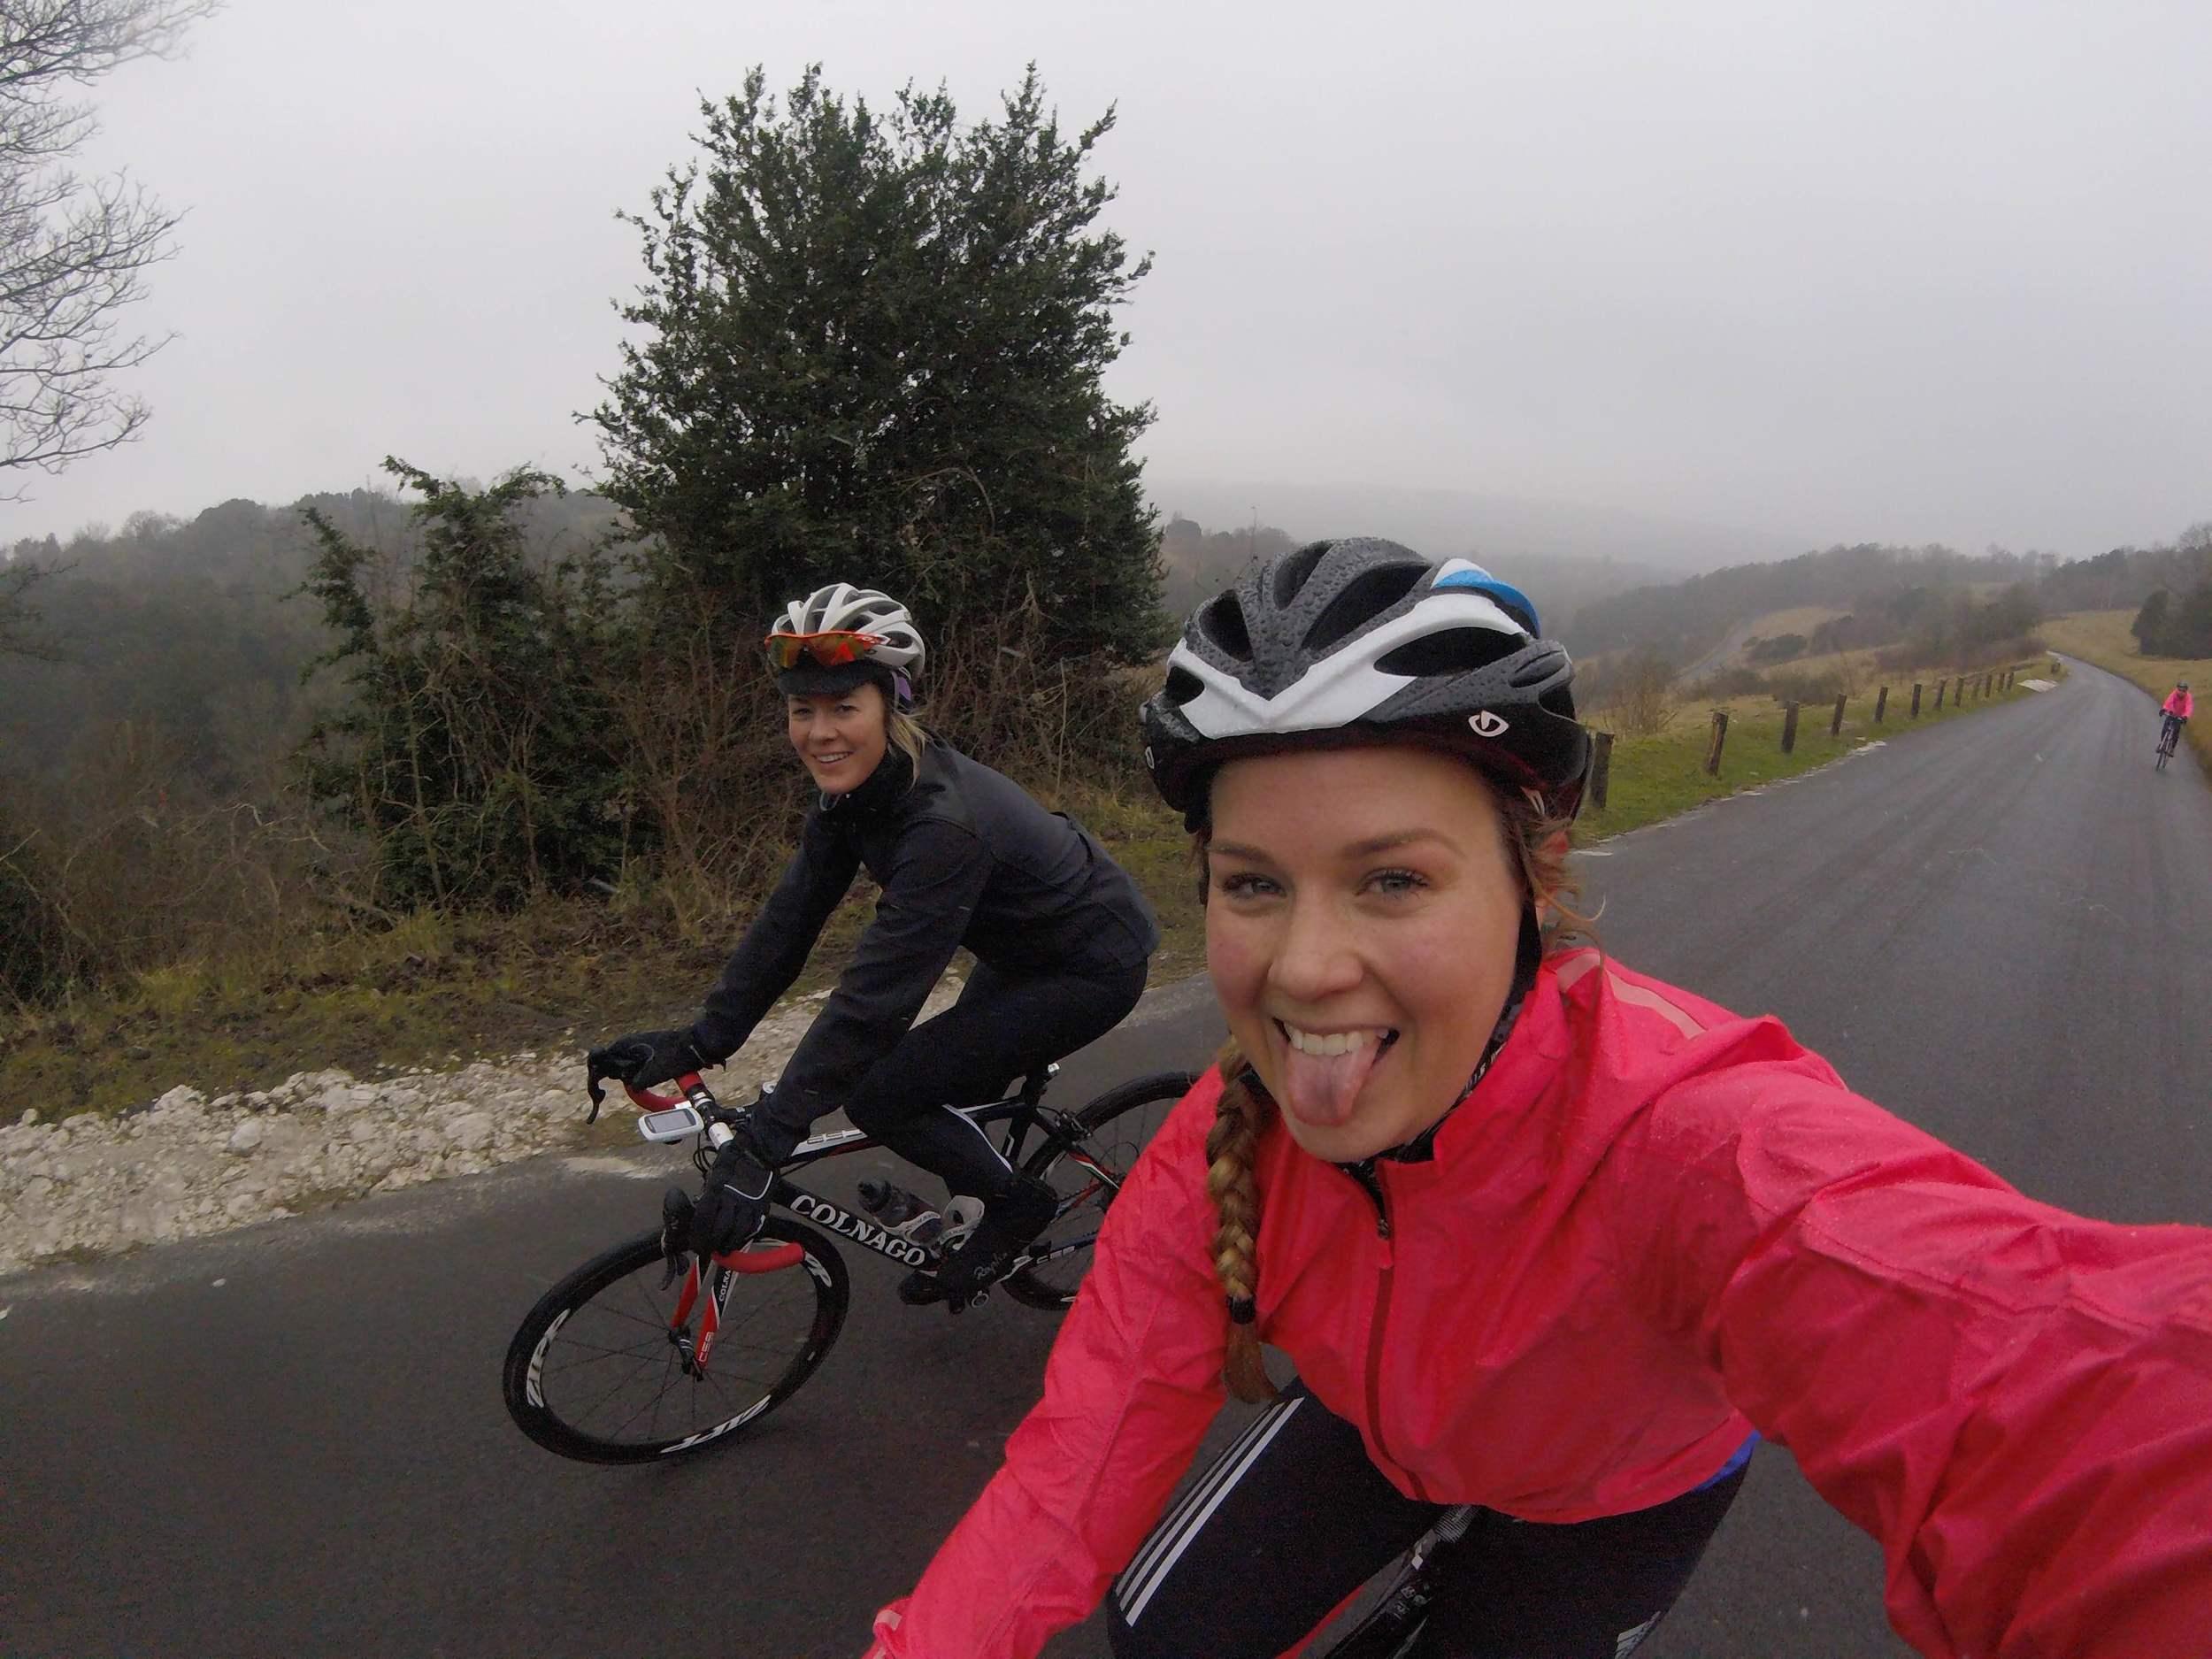 Girls Who Ride - International Women's Day